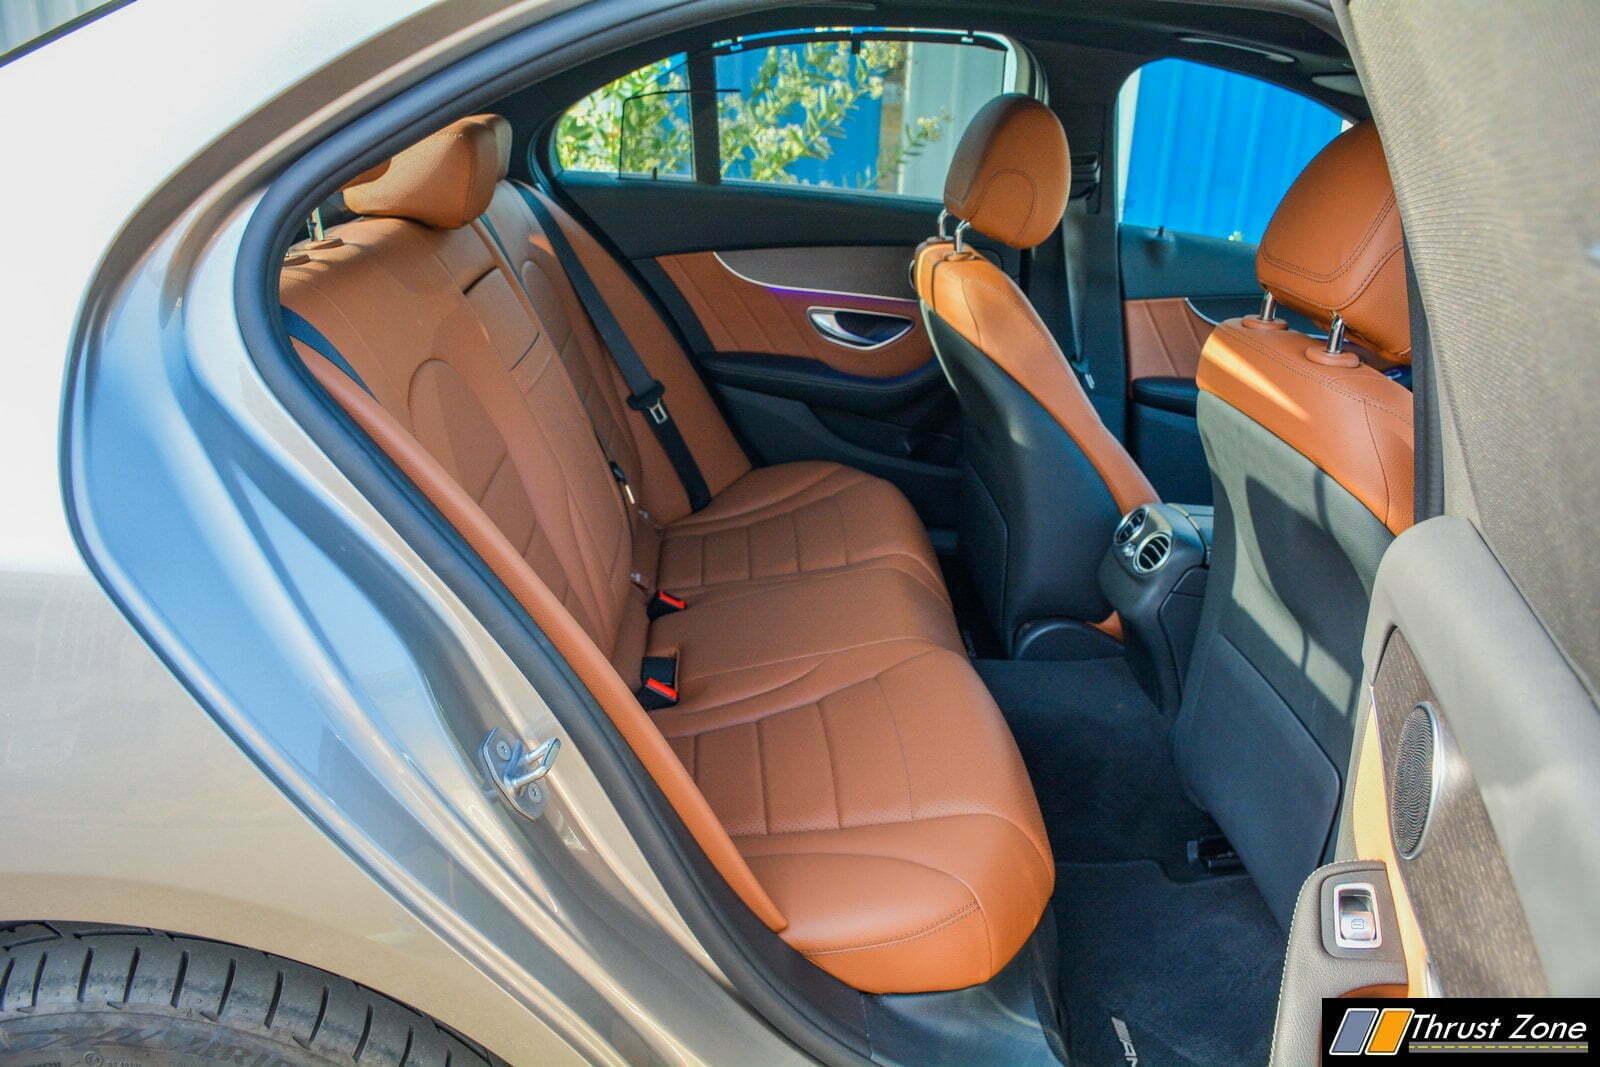 https://www.thrustzone.com/wp-content/uploads/2019/05/2019-Mercedes-C300d-Diesel-India-Review-8.jpg